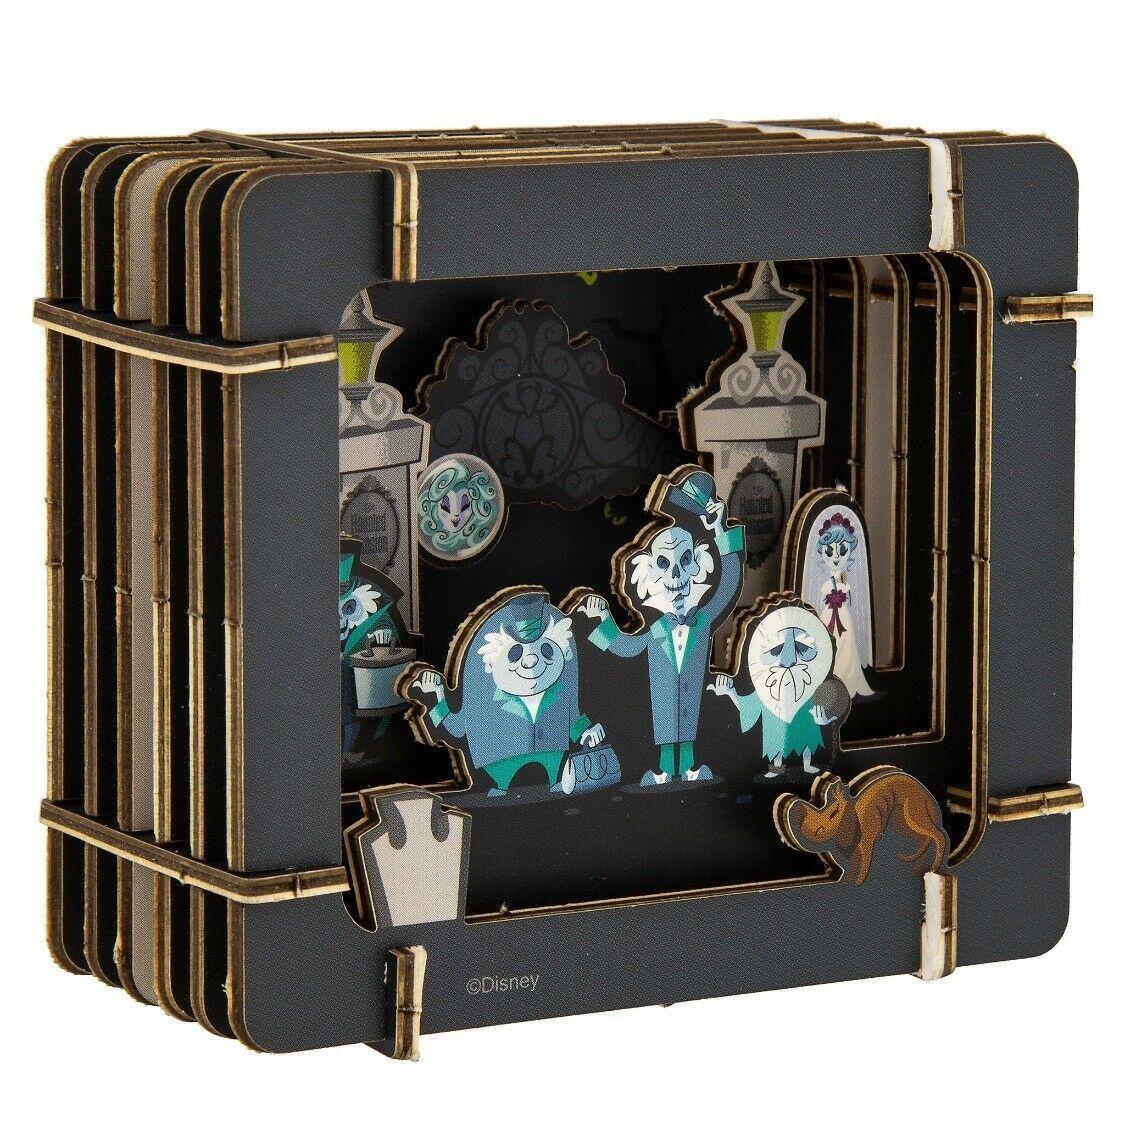 Disney Parks Haunted Mansion Paper 3D Diorama Set New Sealed image 4